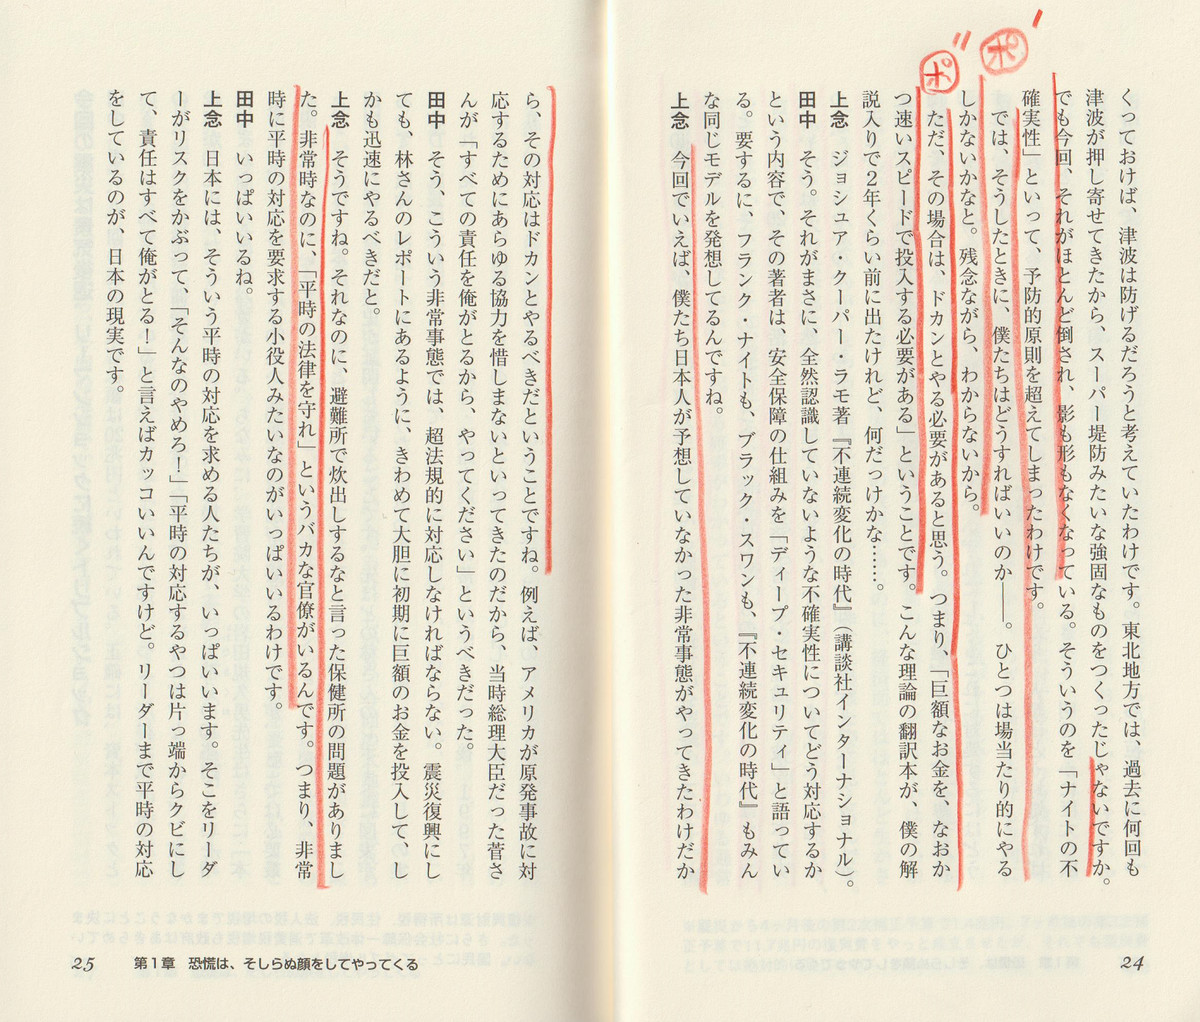 f:id:tanakahidetomi:20200501025652j:plain